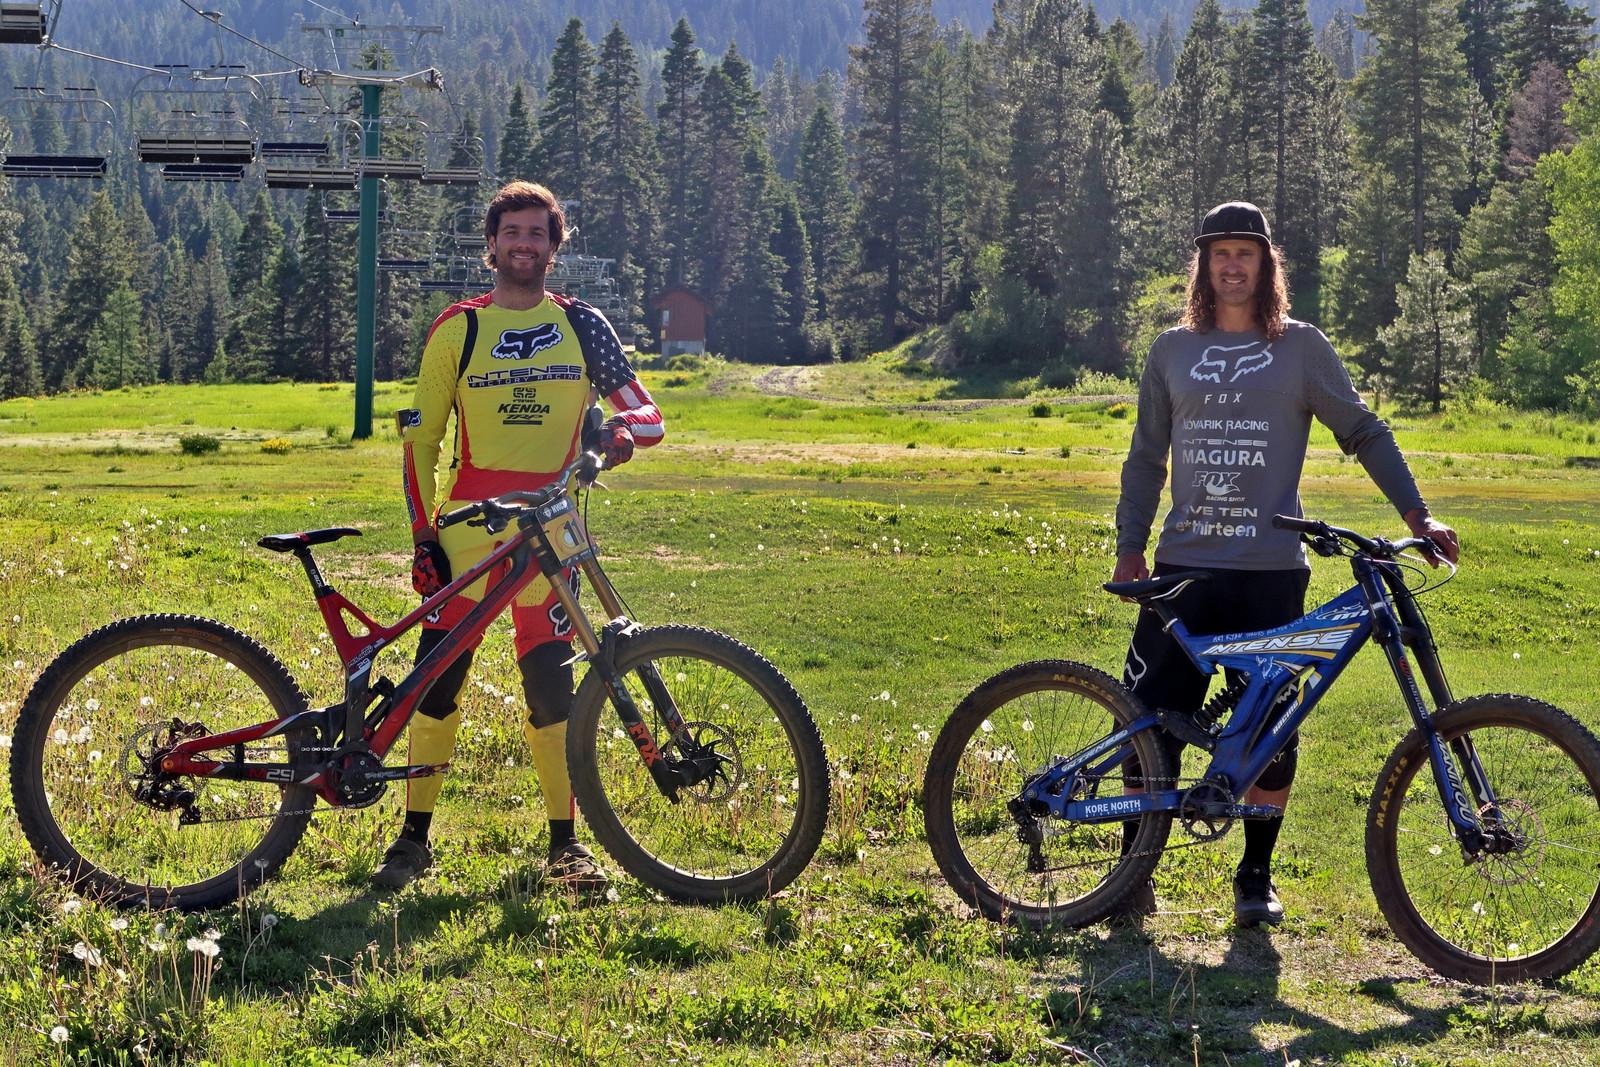 Chris Kovarik and Neko Mulally - PIT BITS - Tamarack Pro GRT / NW Cup - Mountain Biking Pictures - Vital MTB